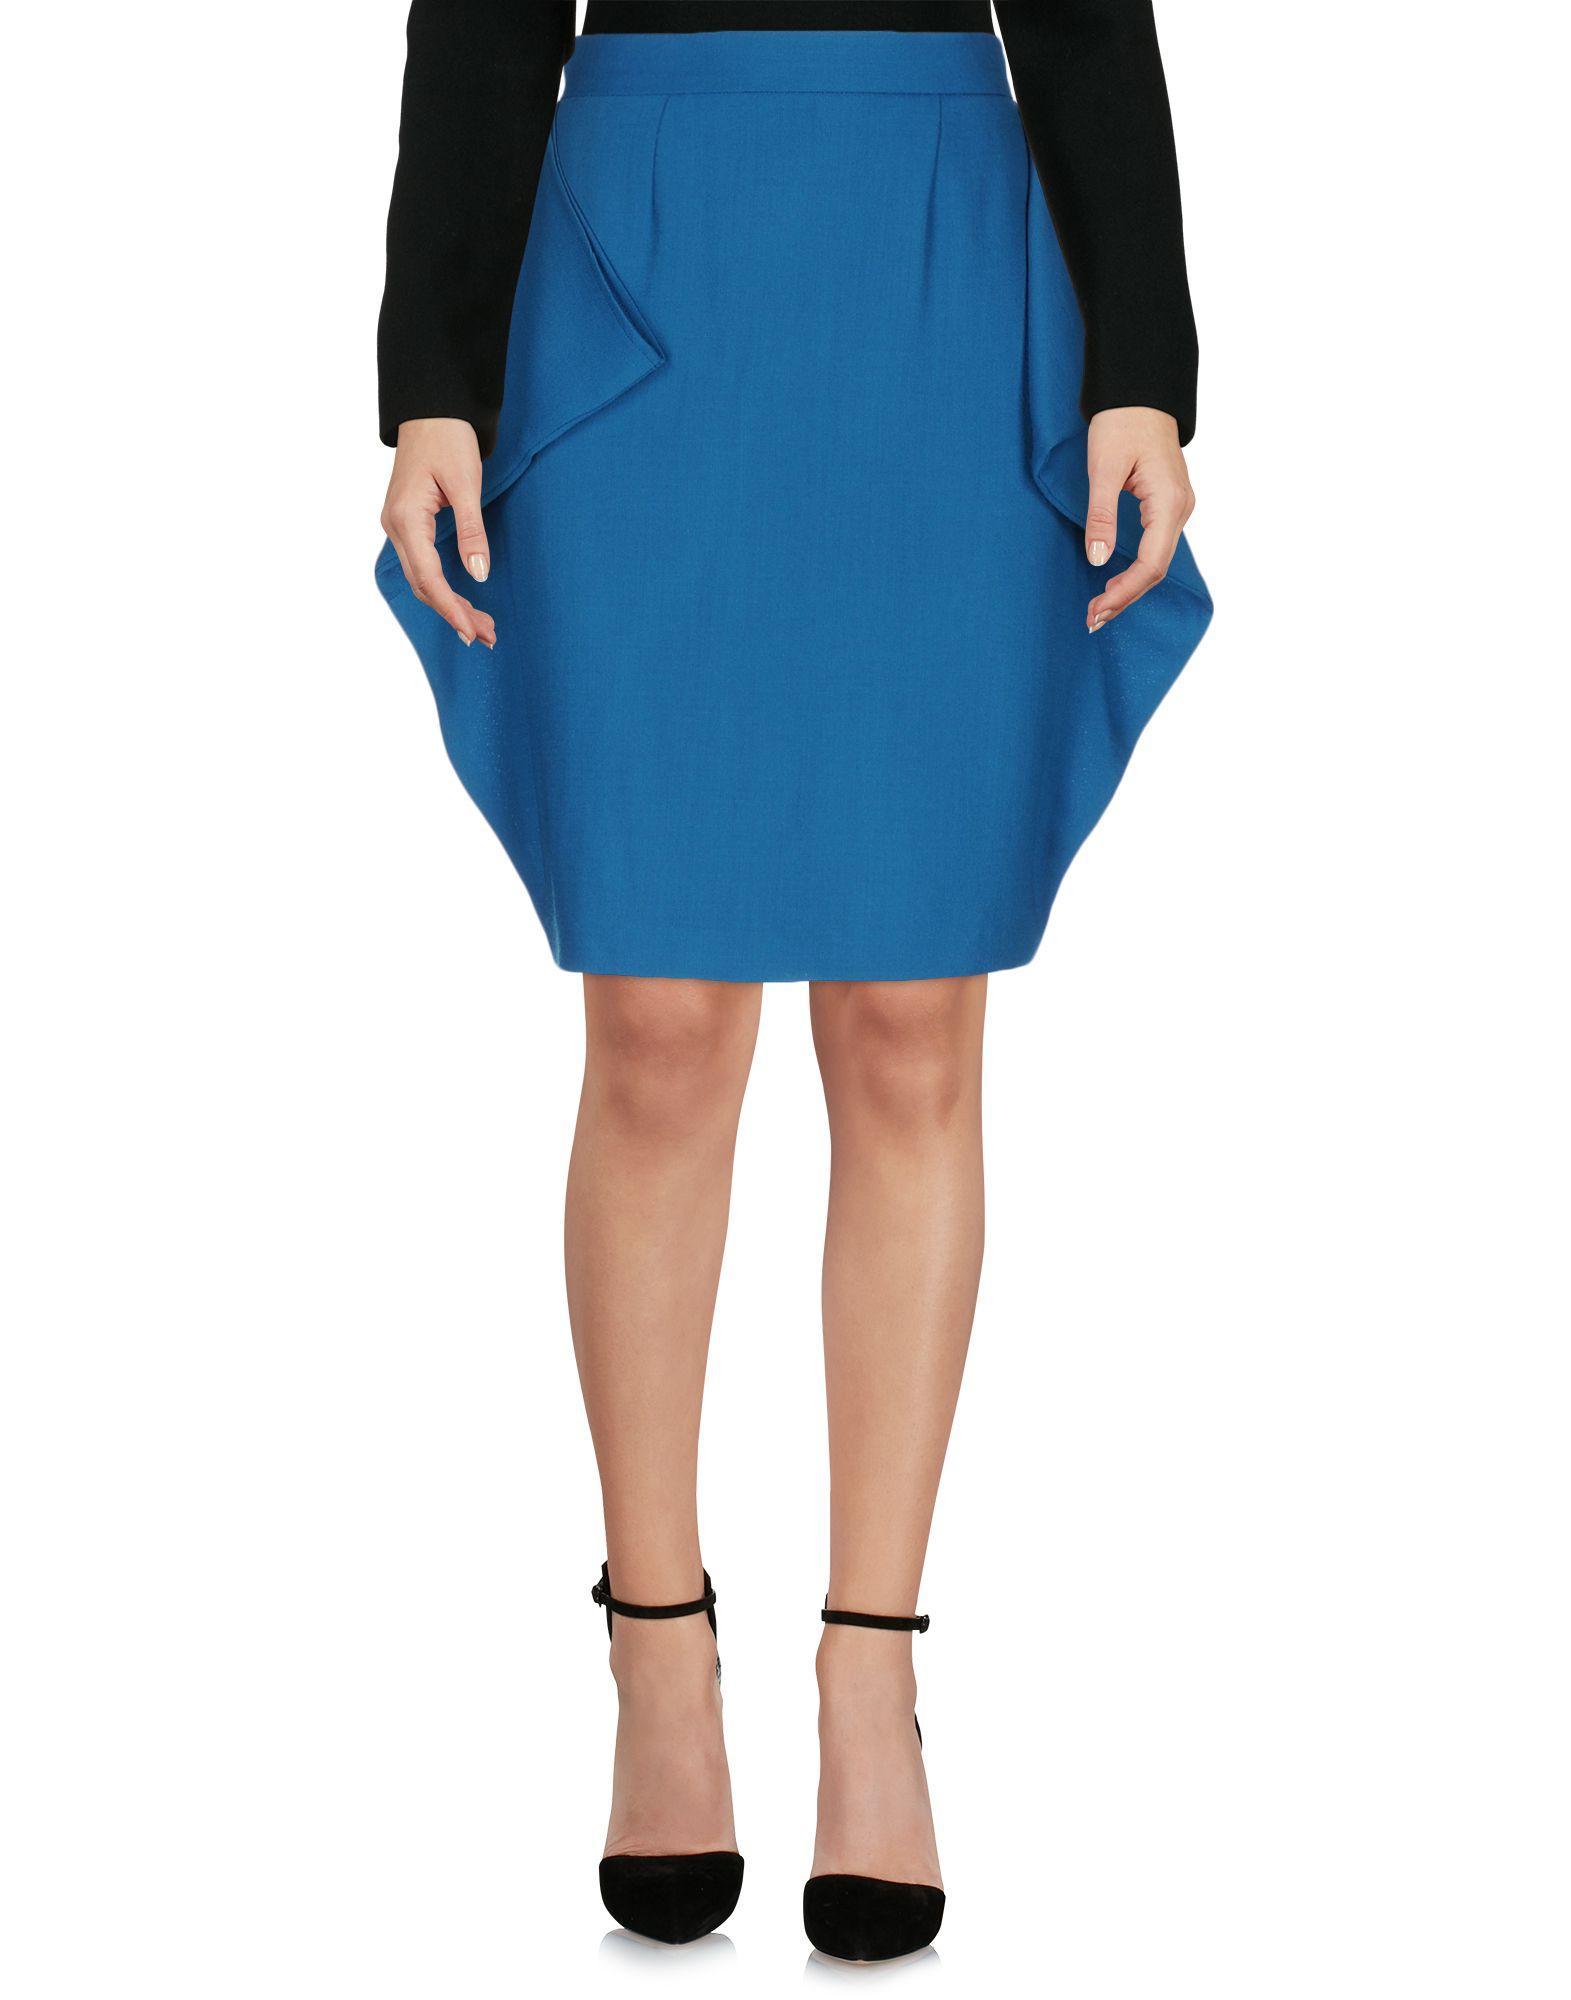 JC DE CASTELBAJAC Knee Length Skirt in Deep Jade